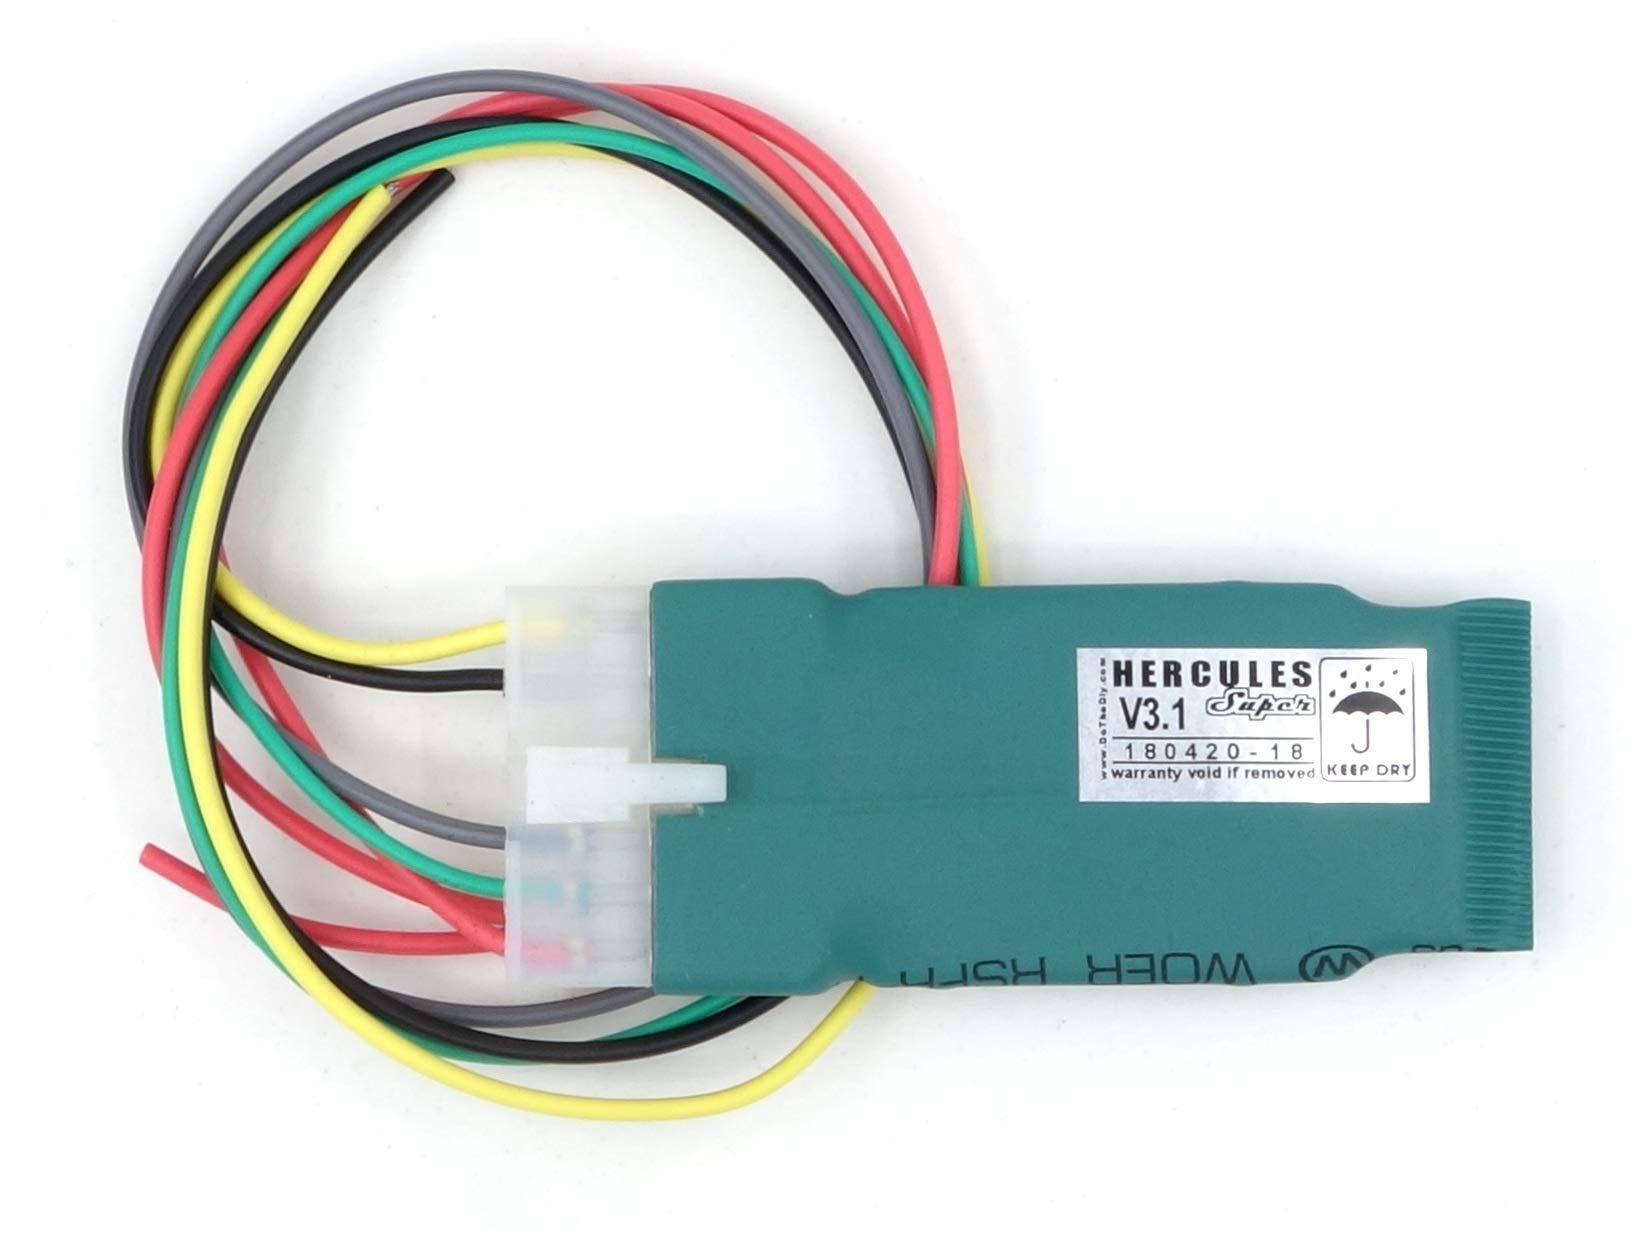 DoTheDiy Hercules Super Hazard Adapter for Bajaj Dominar 400/250,RS200, KTM Duke(125/200/250/390)/RC(125/200/390)(2019) Without 14-pin Connector (100 Patterns) (1 Year Warranty)